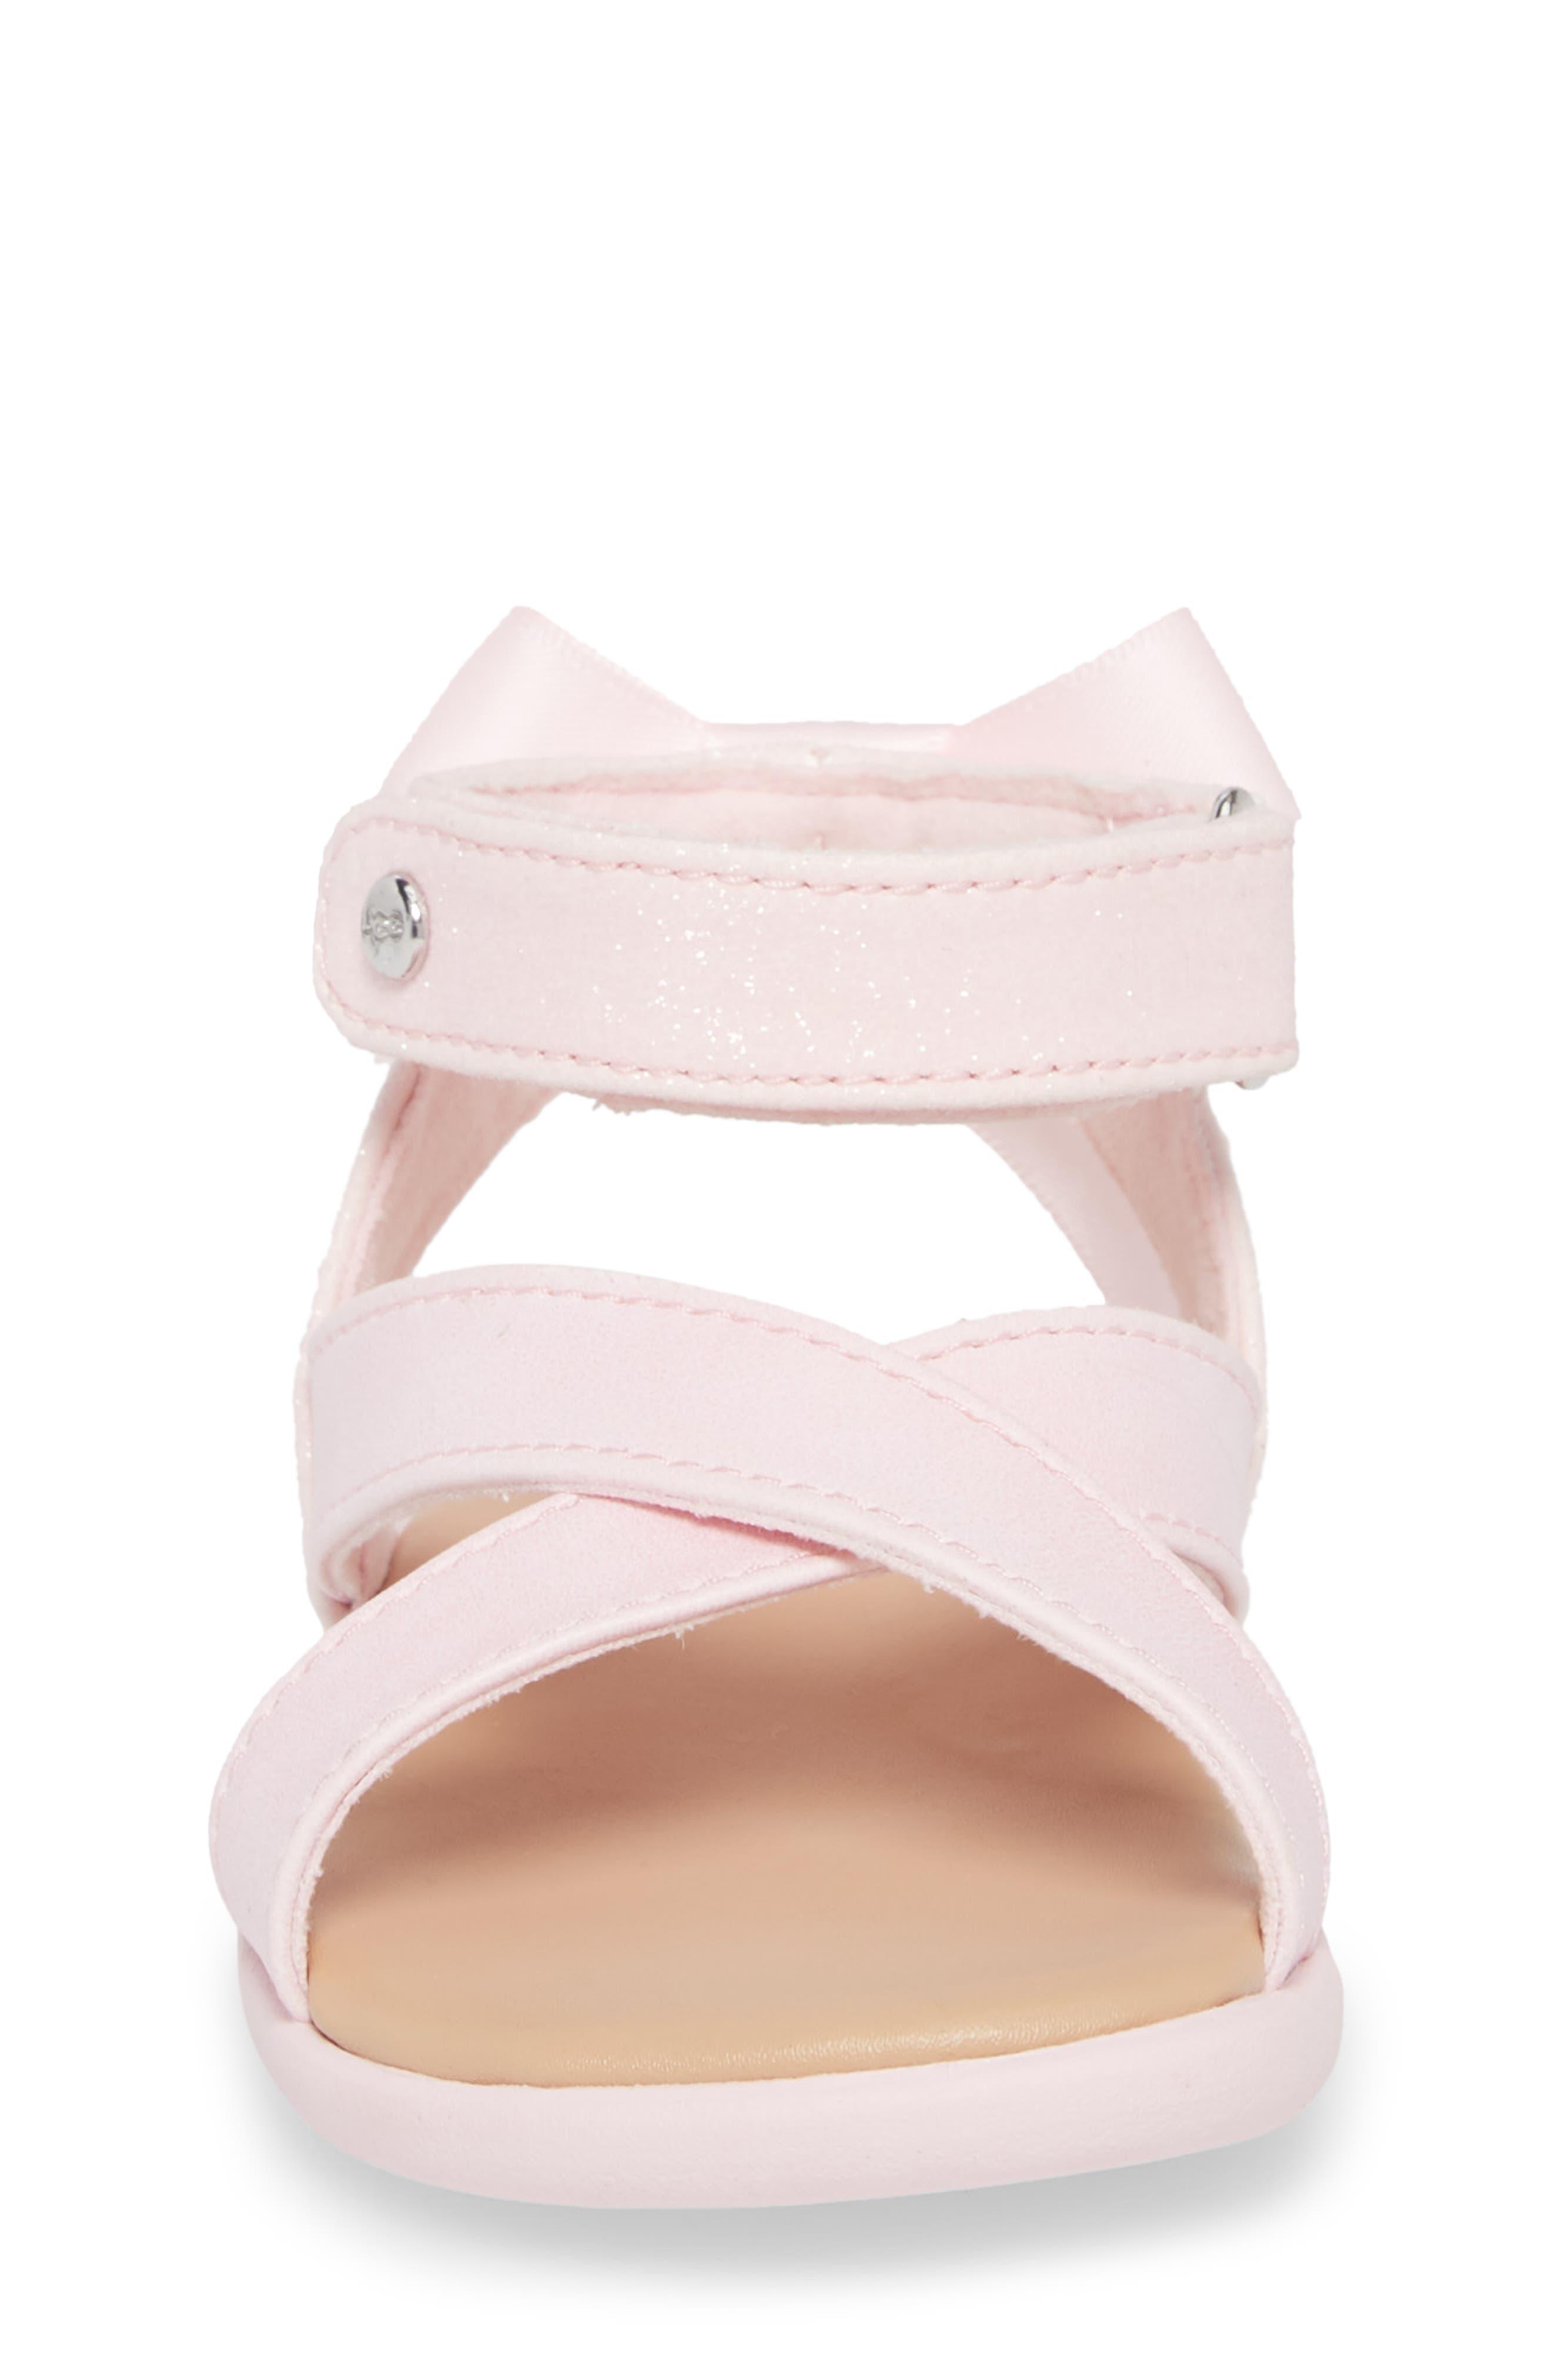 Maggiepie Sparkles Sandal,                             Alternate thumbnail 4, color,                             Seashell Pink